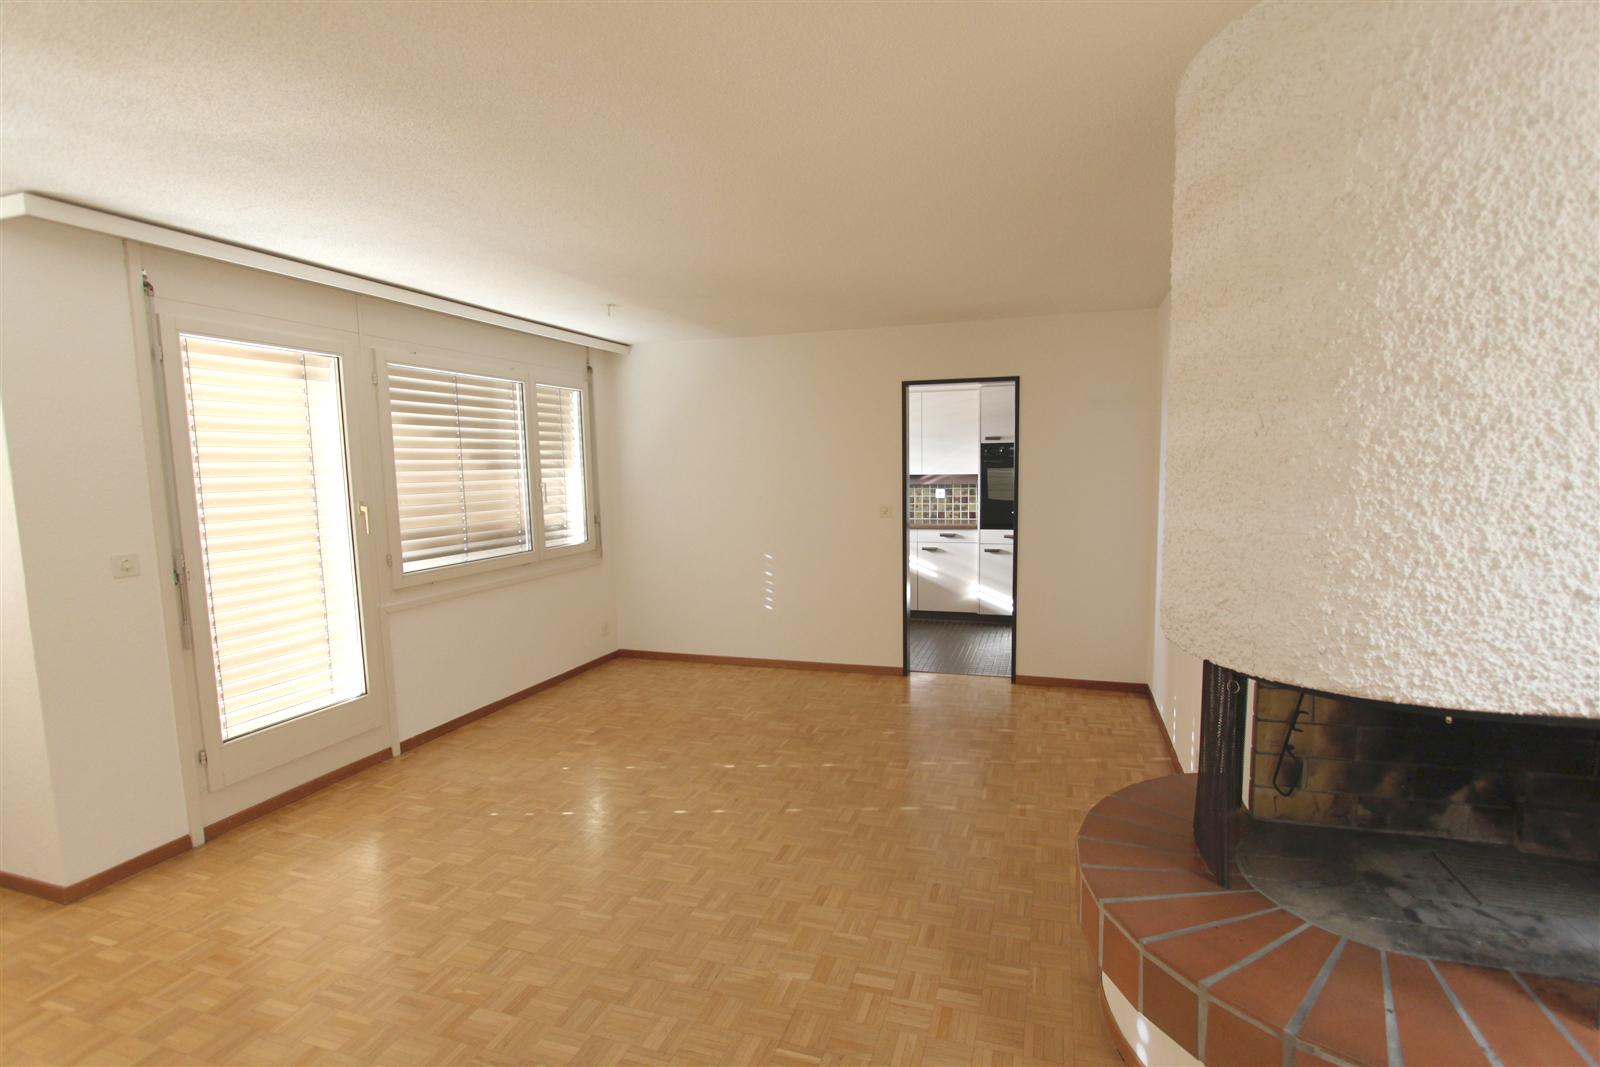 03 Interior Rosenhalde - 002